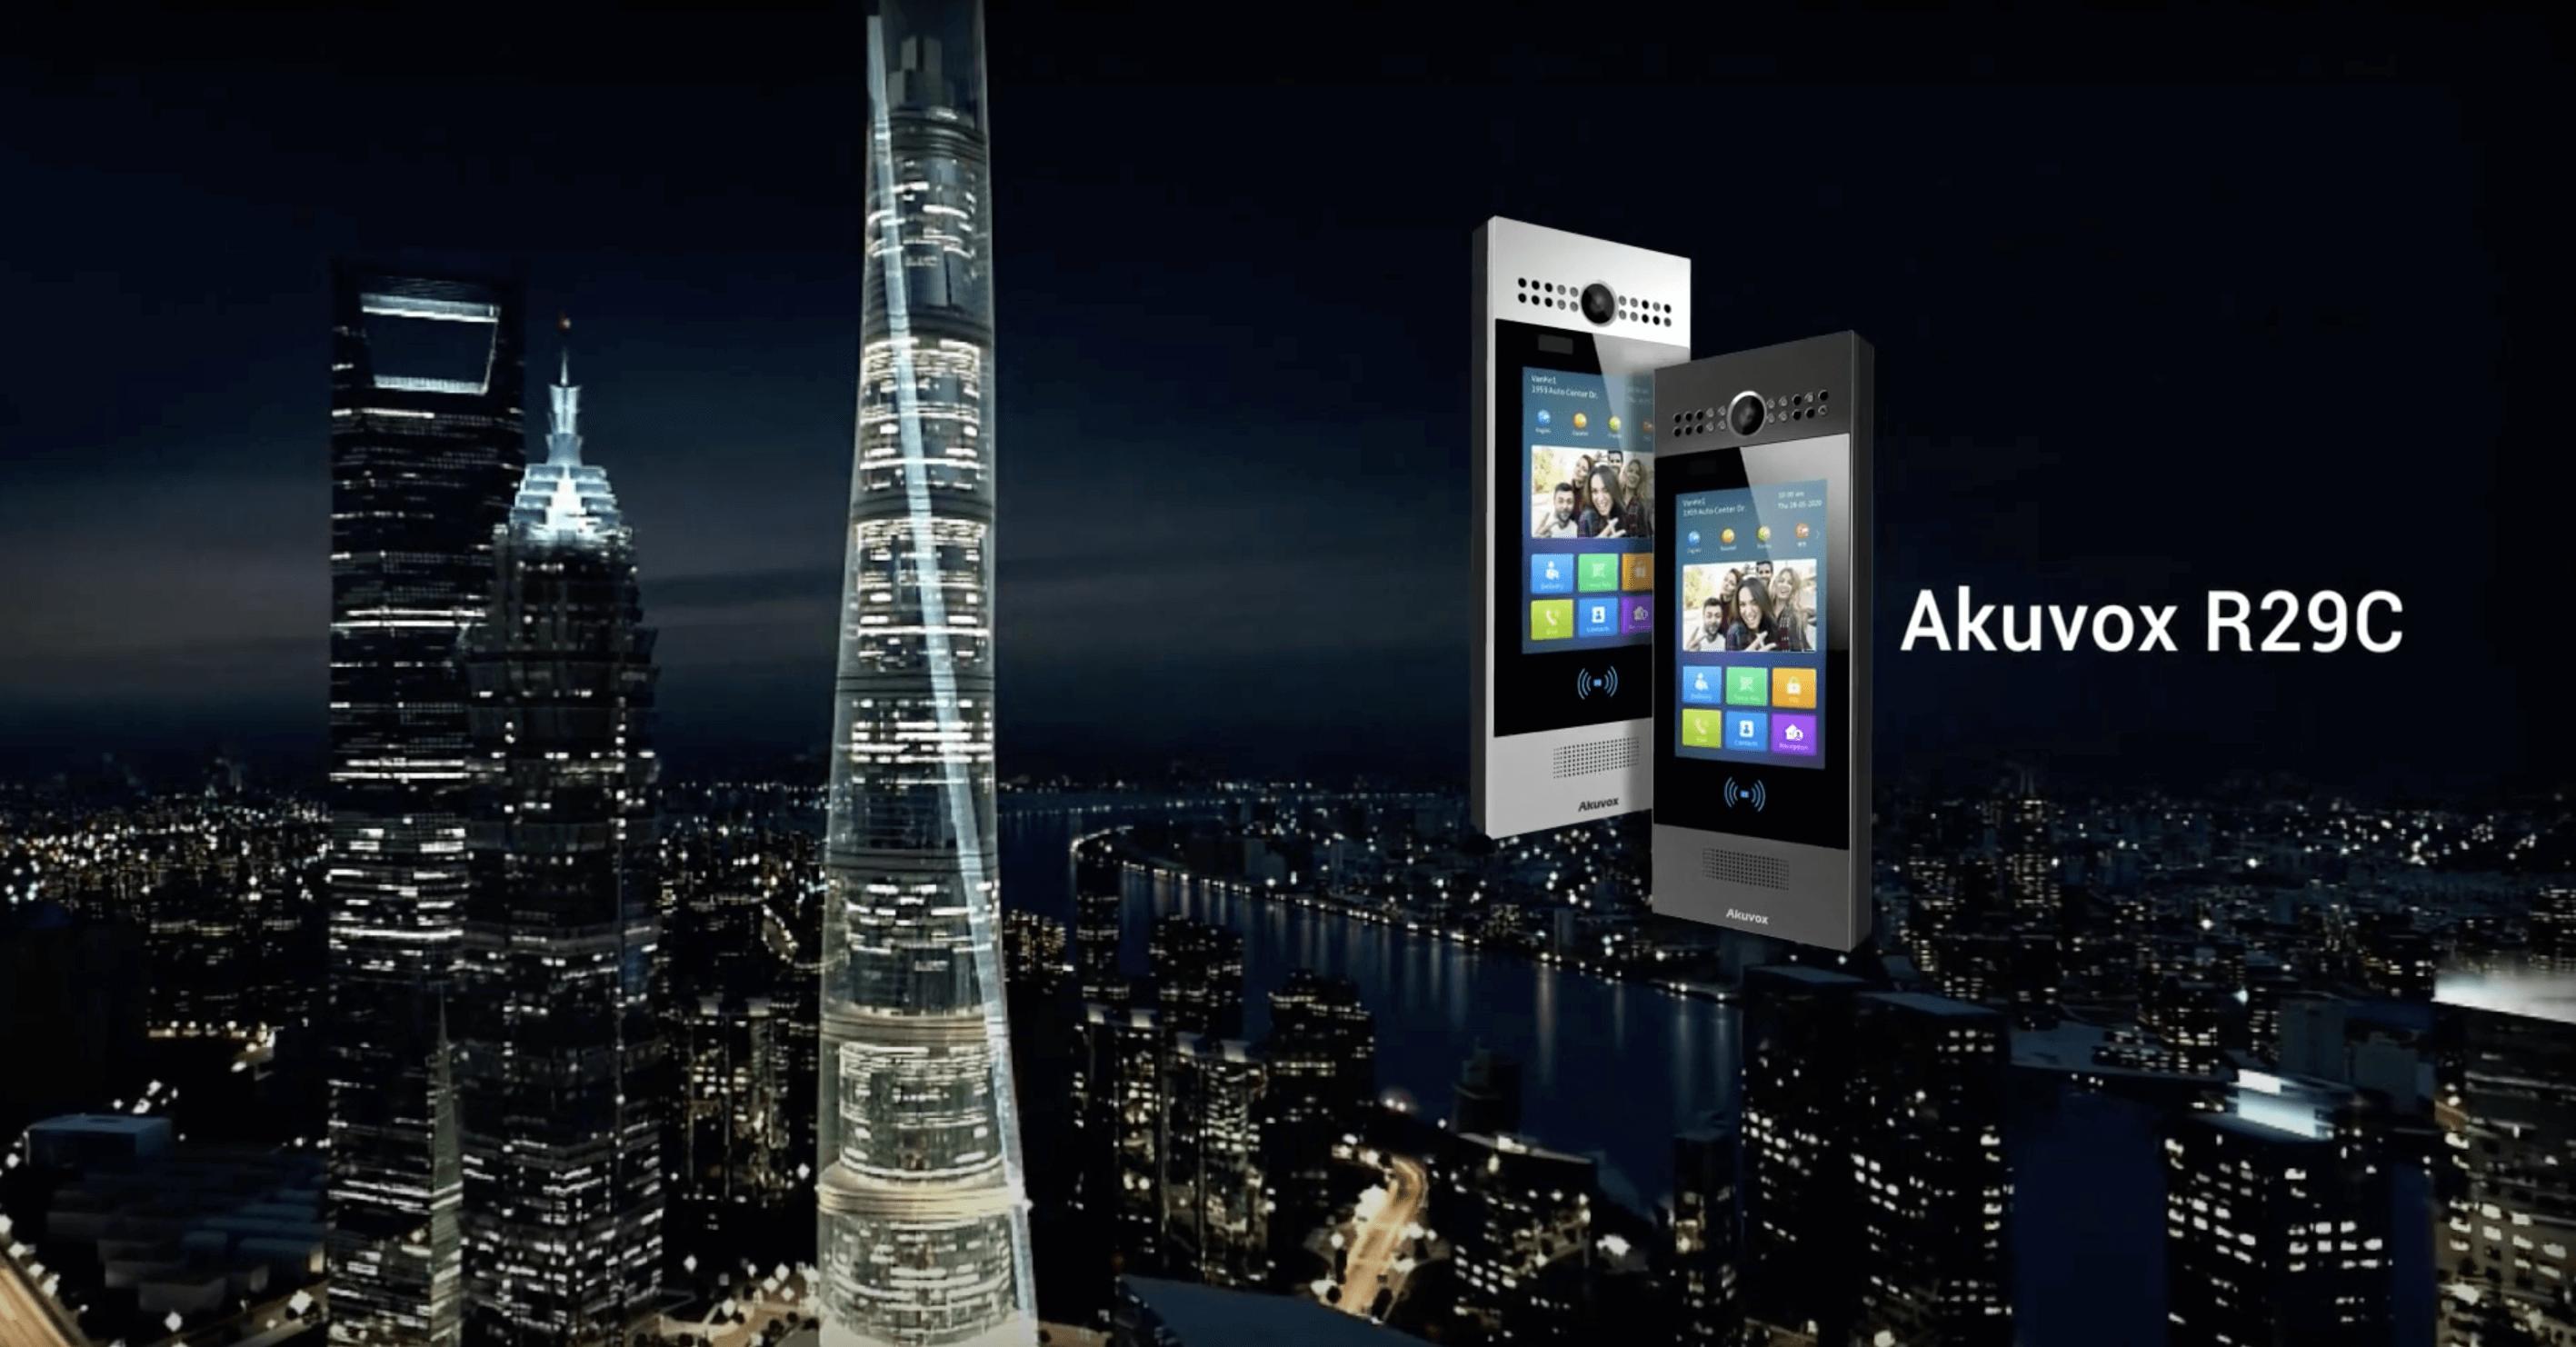 Akuvox社高機能インターフォンR29C紹介ビデオ